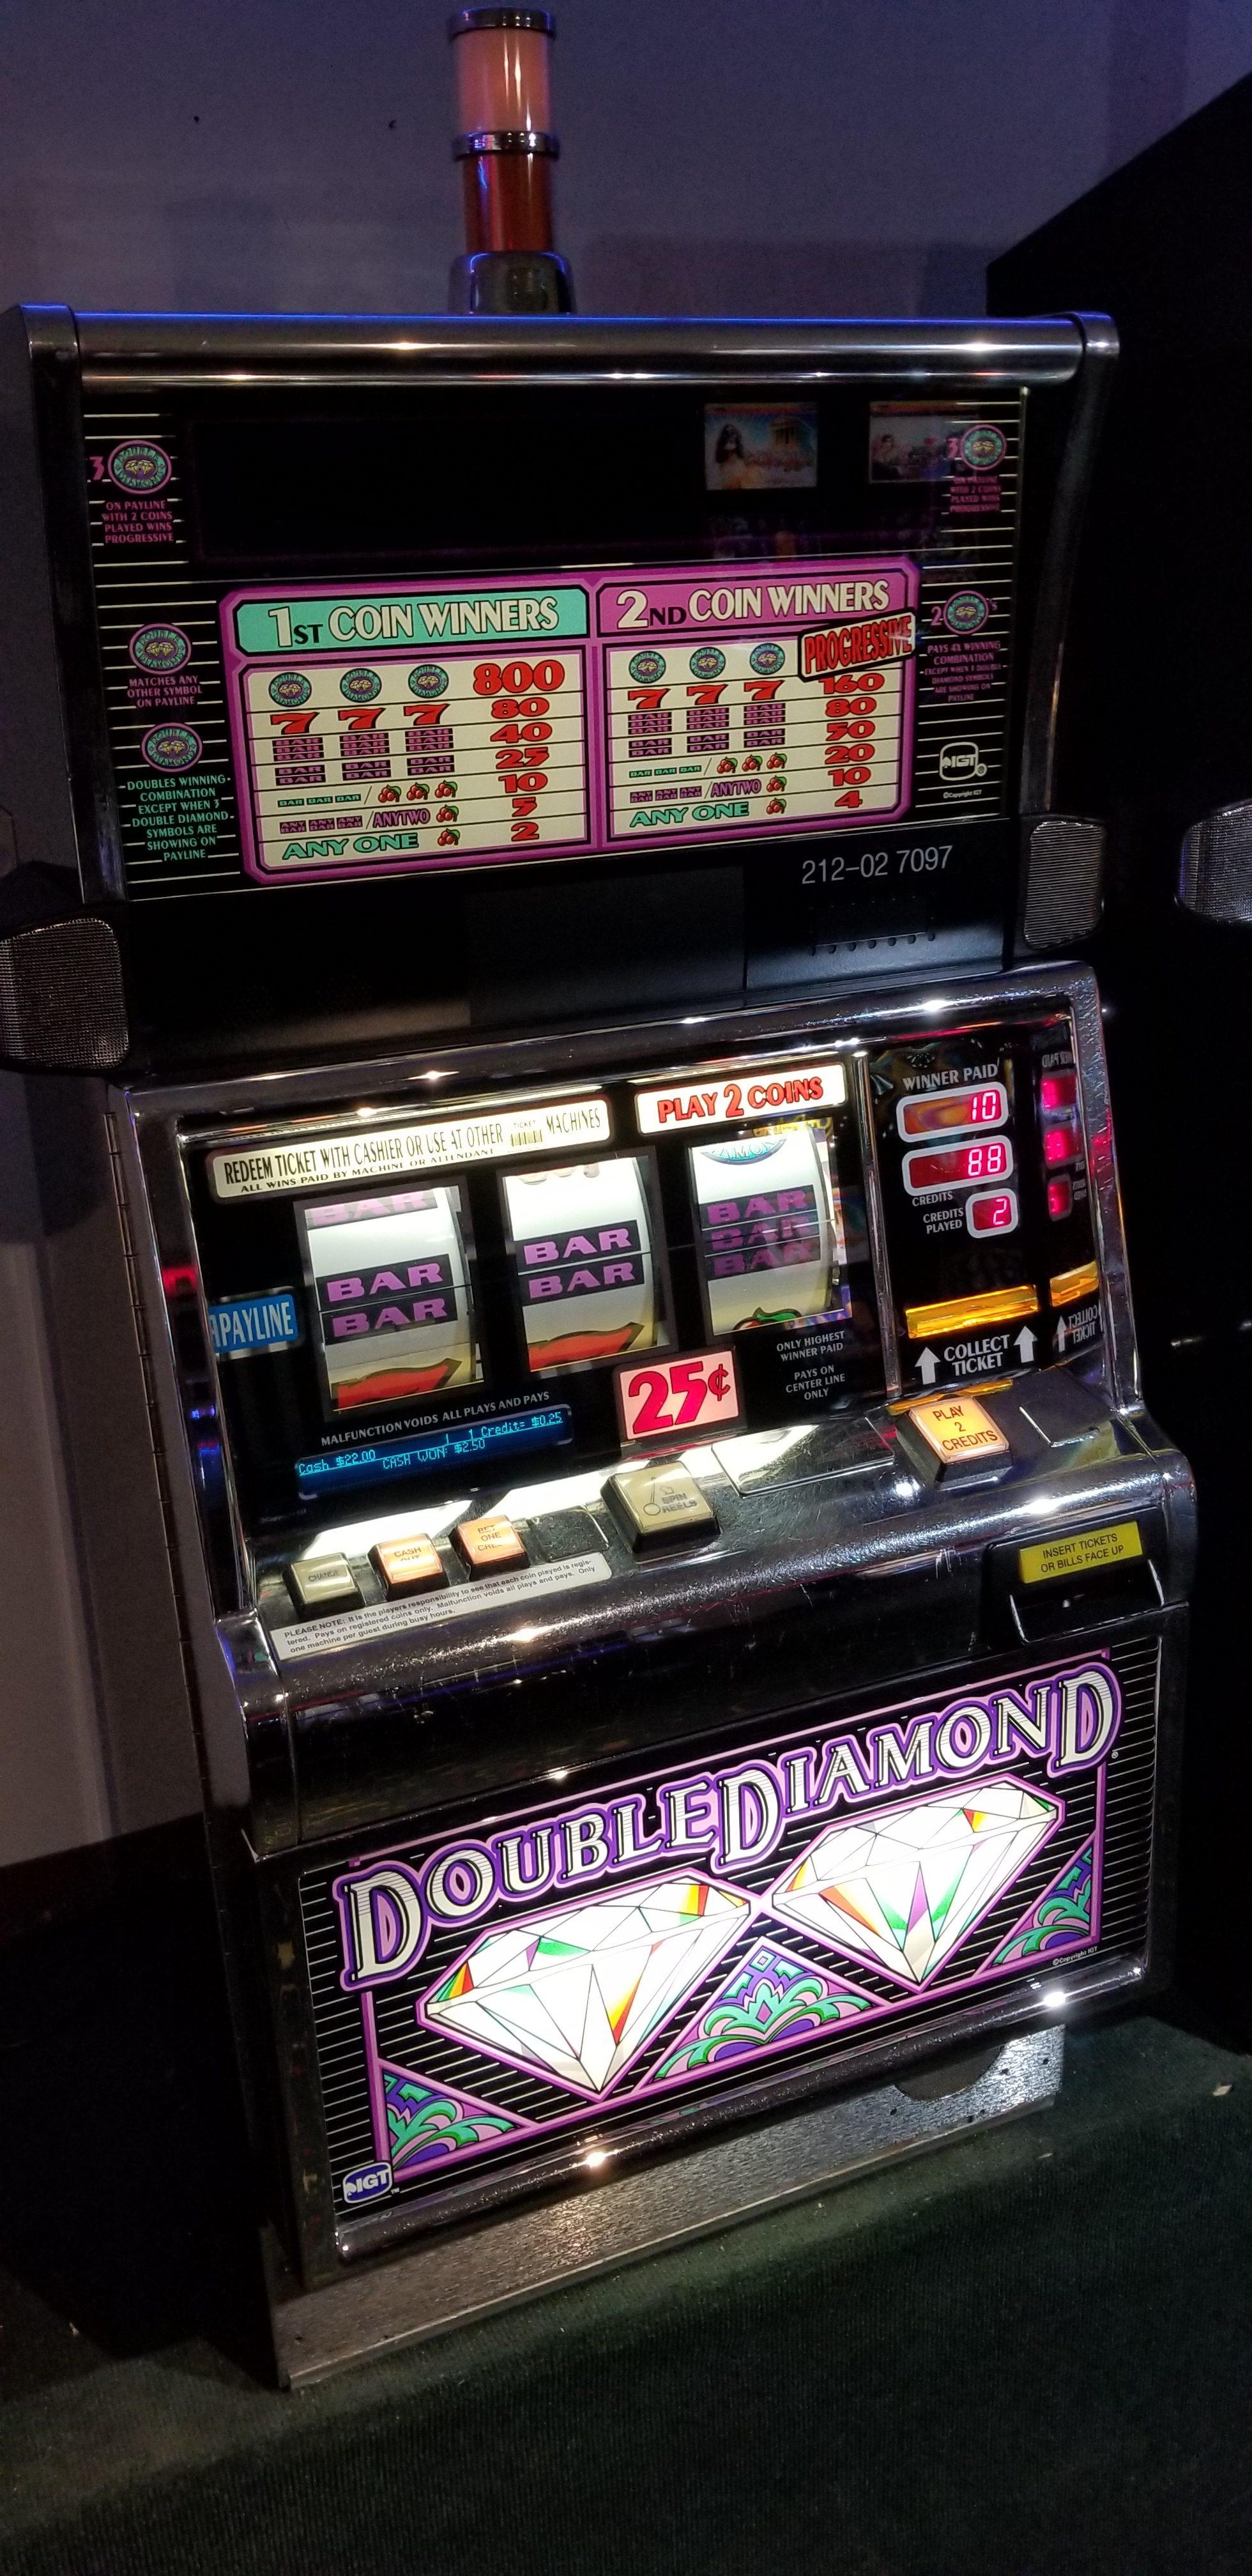 Igt S2000 Double Diamond 25c Slot Machine Slot Machines